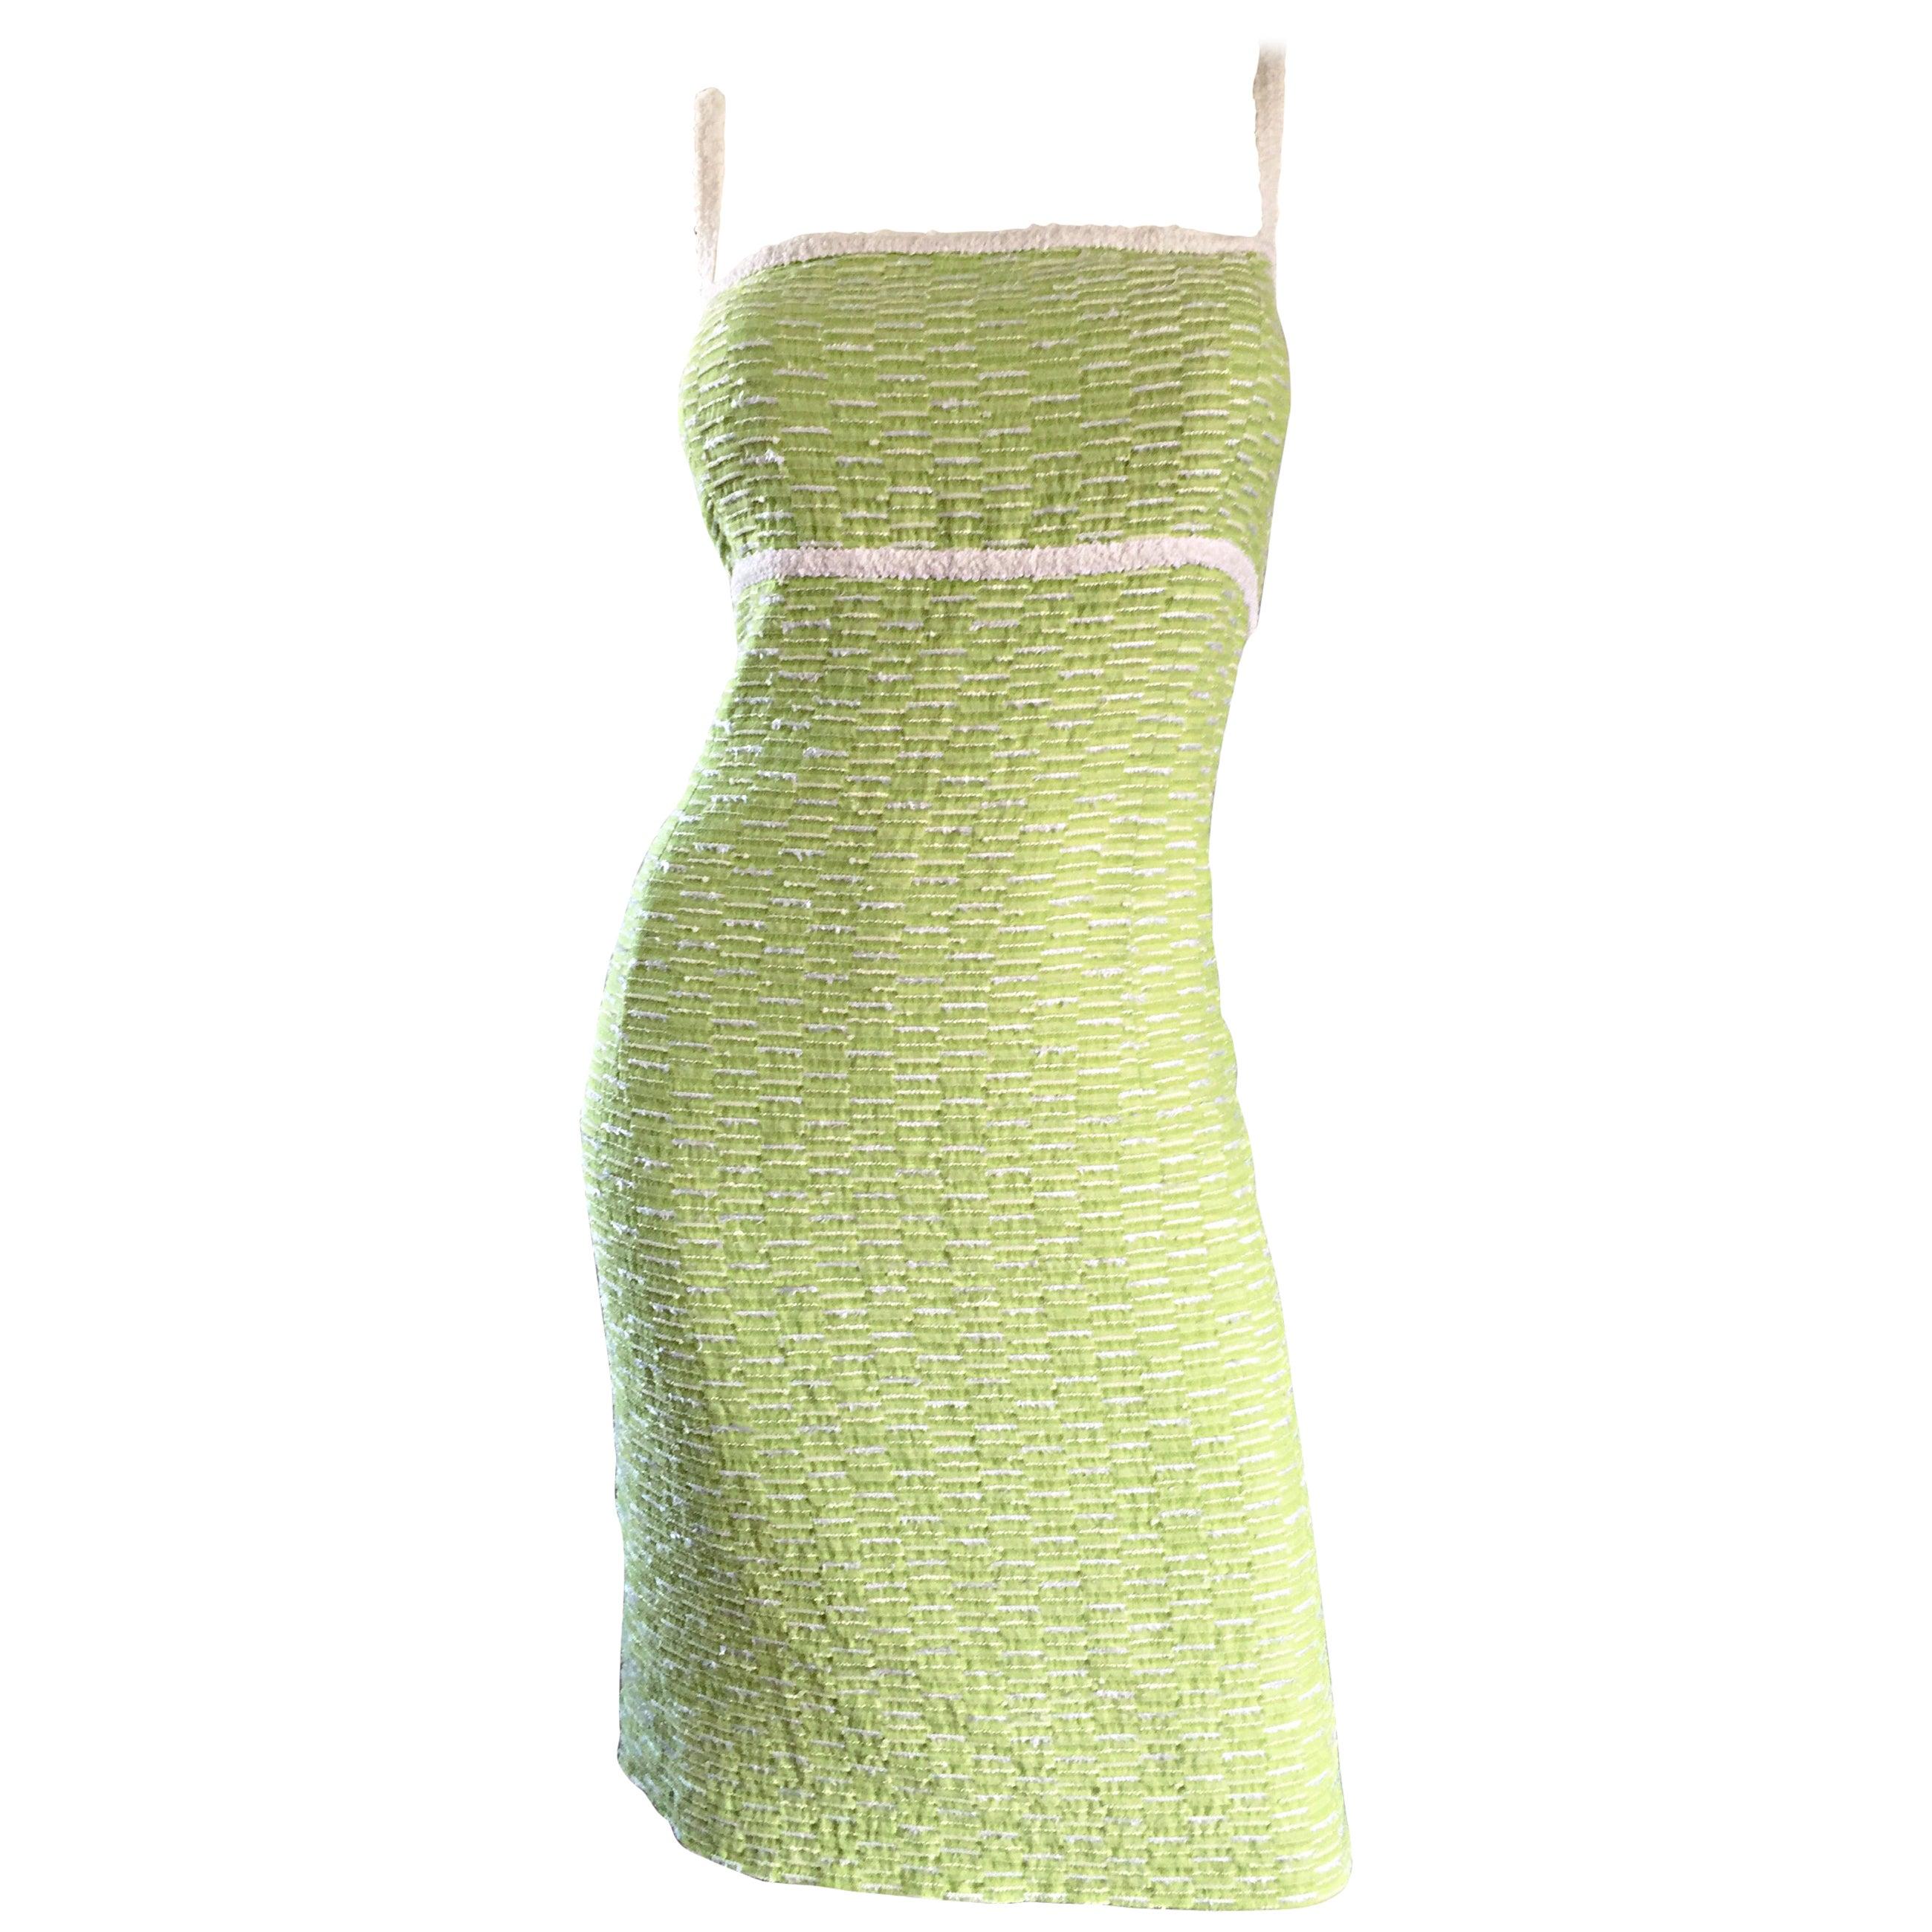 Escada Margaretha Ley Late 1990s Light Green White Boucle Size 452 12 - 14 Dress